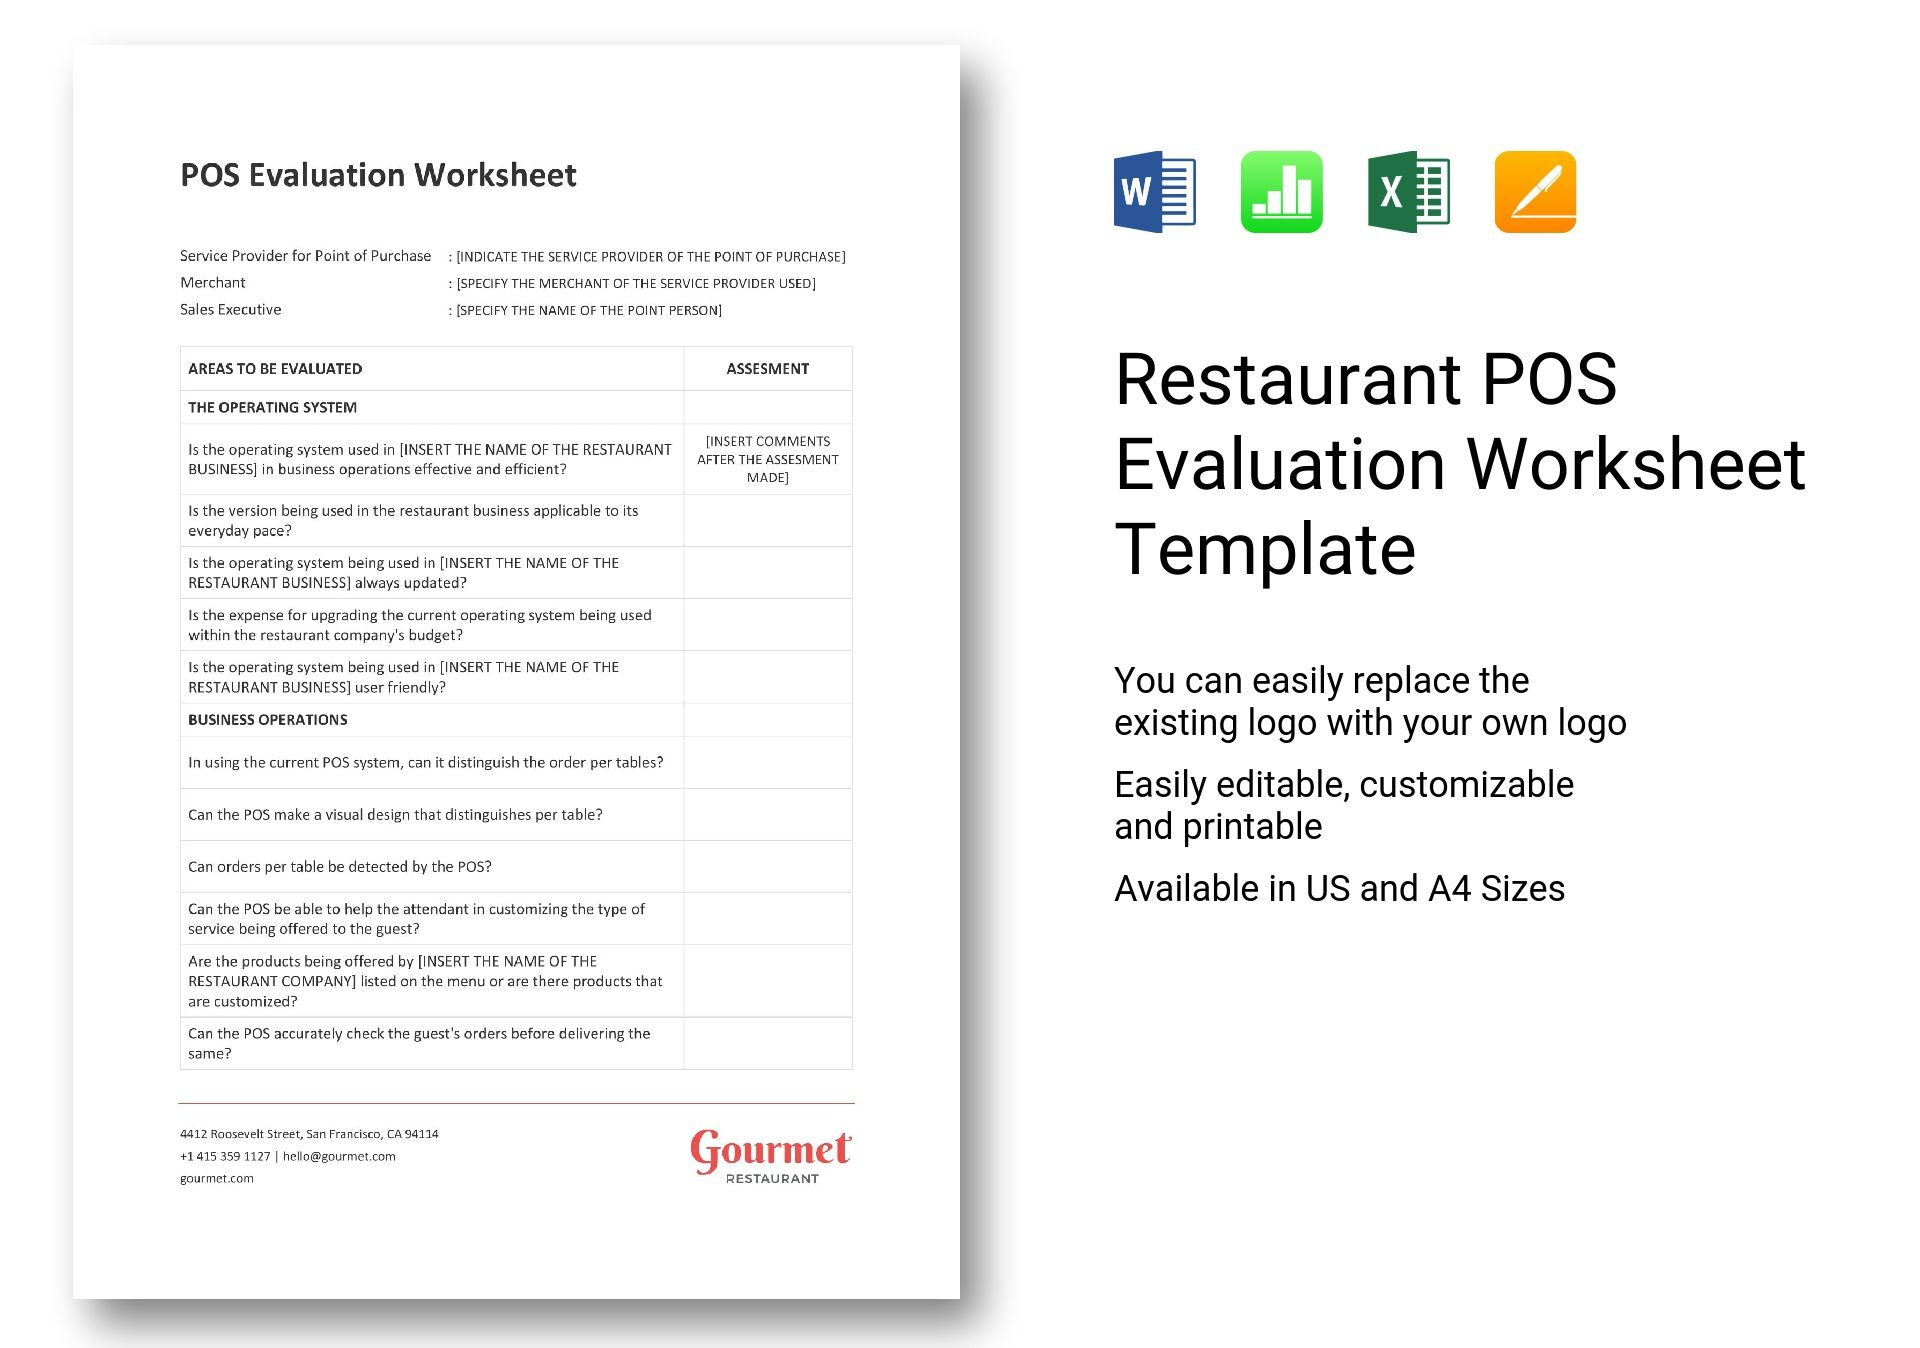 Restaurant Pos Evaluation Worksheet Template In Word